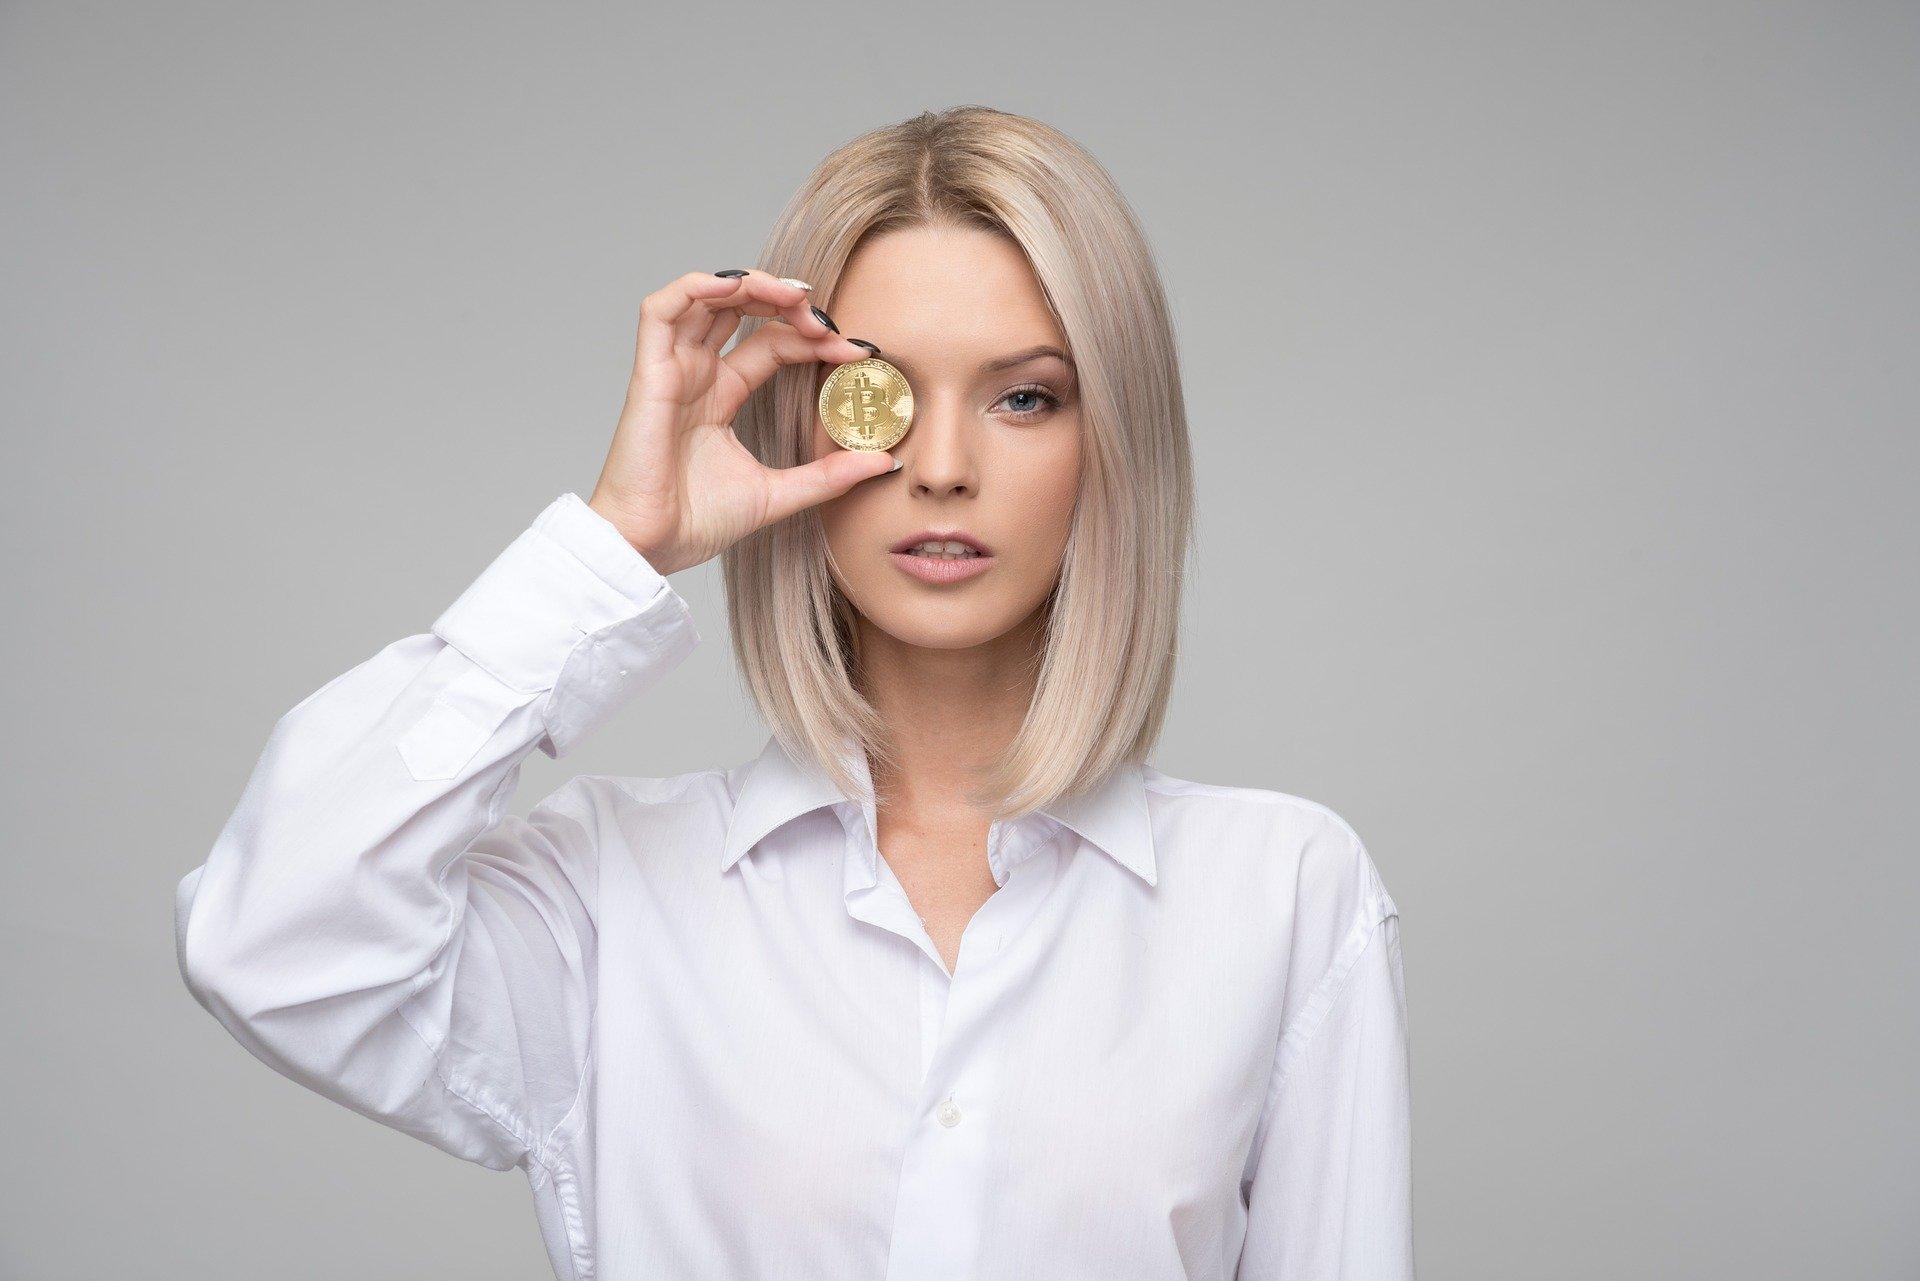 Bitcoin versichern - geht das? Symbolbild: Icons8_team via Pixabay